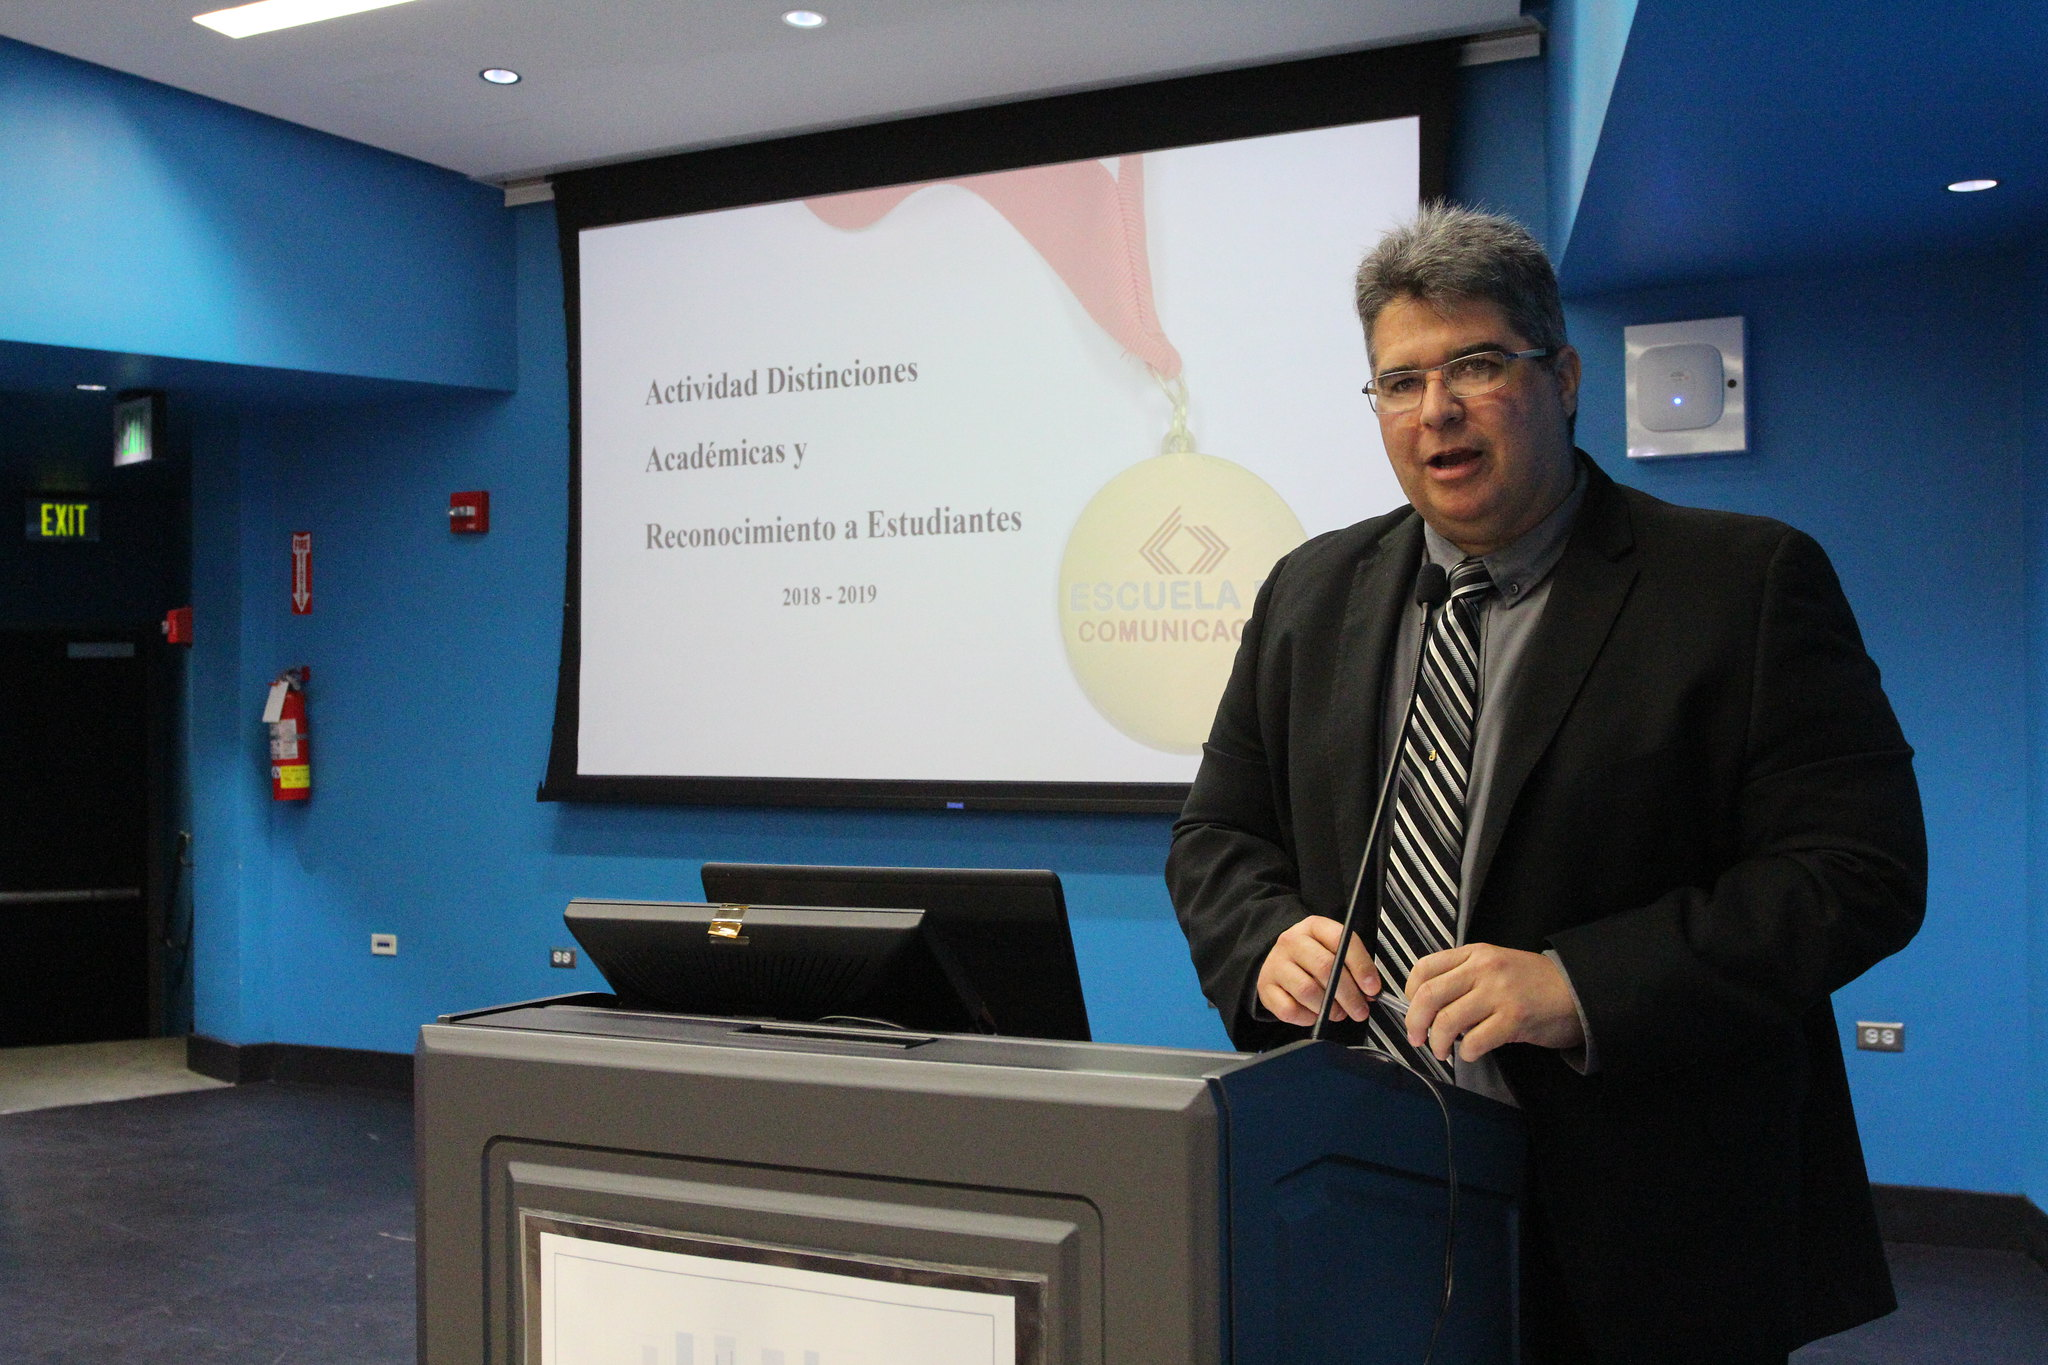 Dr. Jorge Santiago Pintor